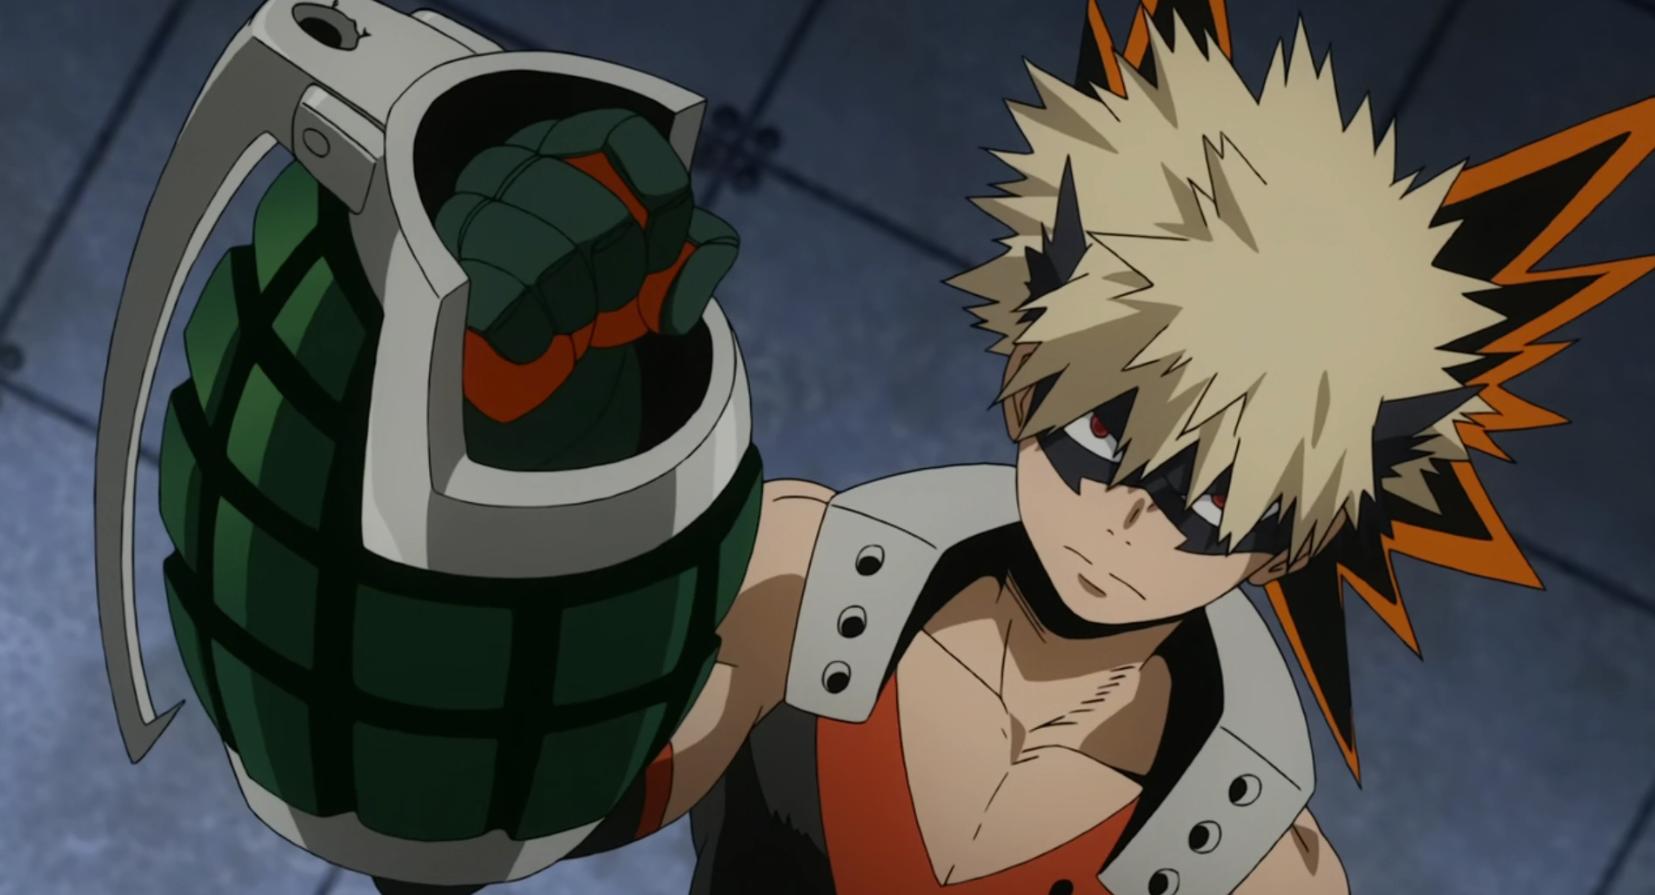 Bakugo est un personnage emblématique de My Hero Academia